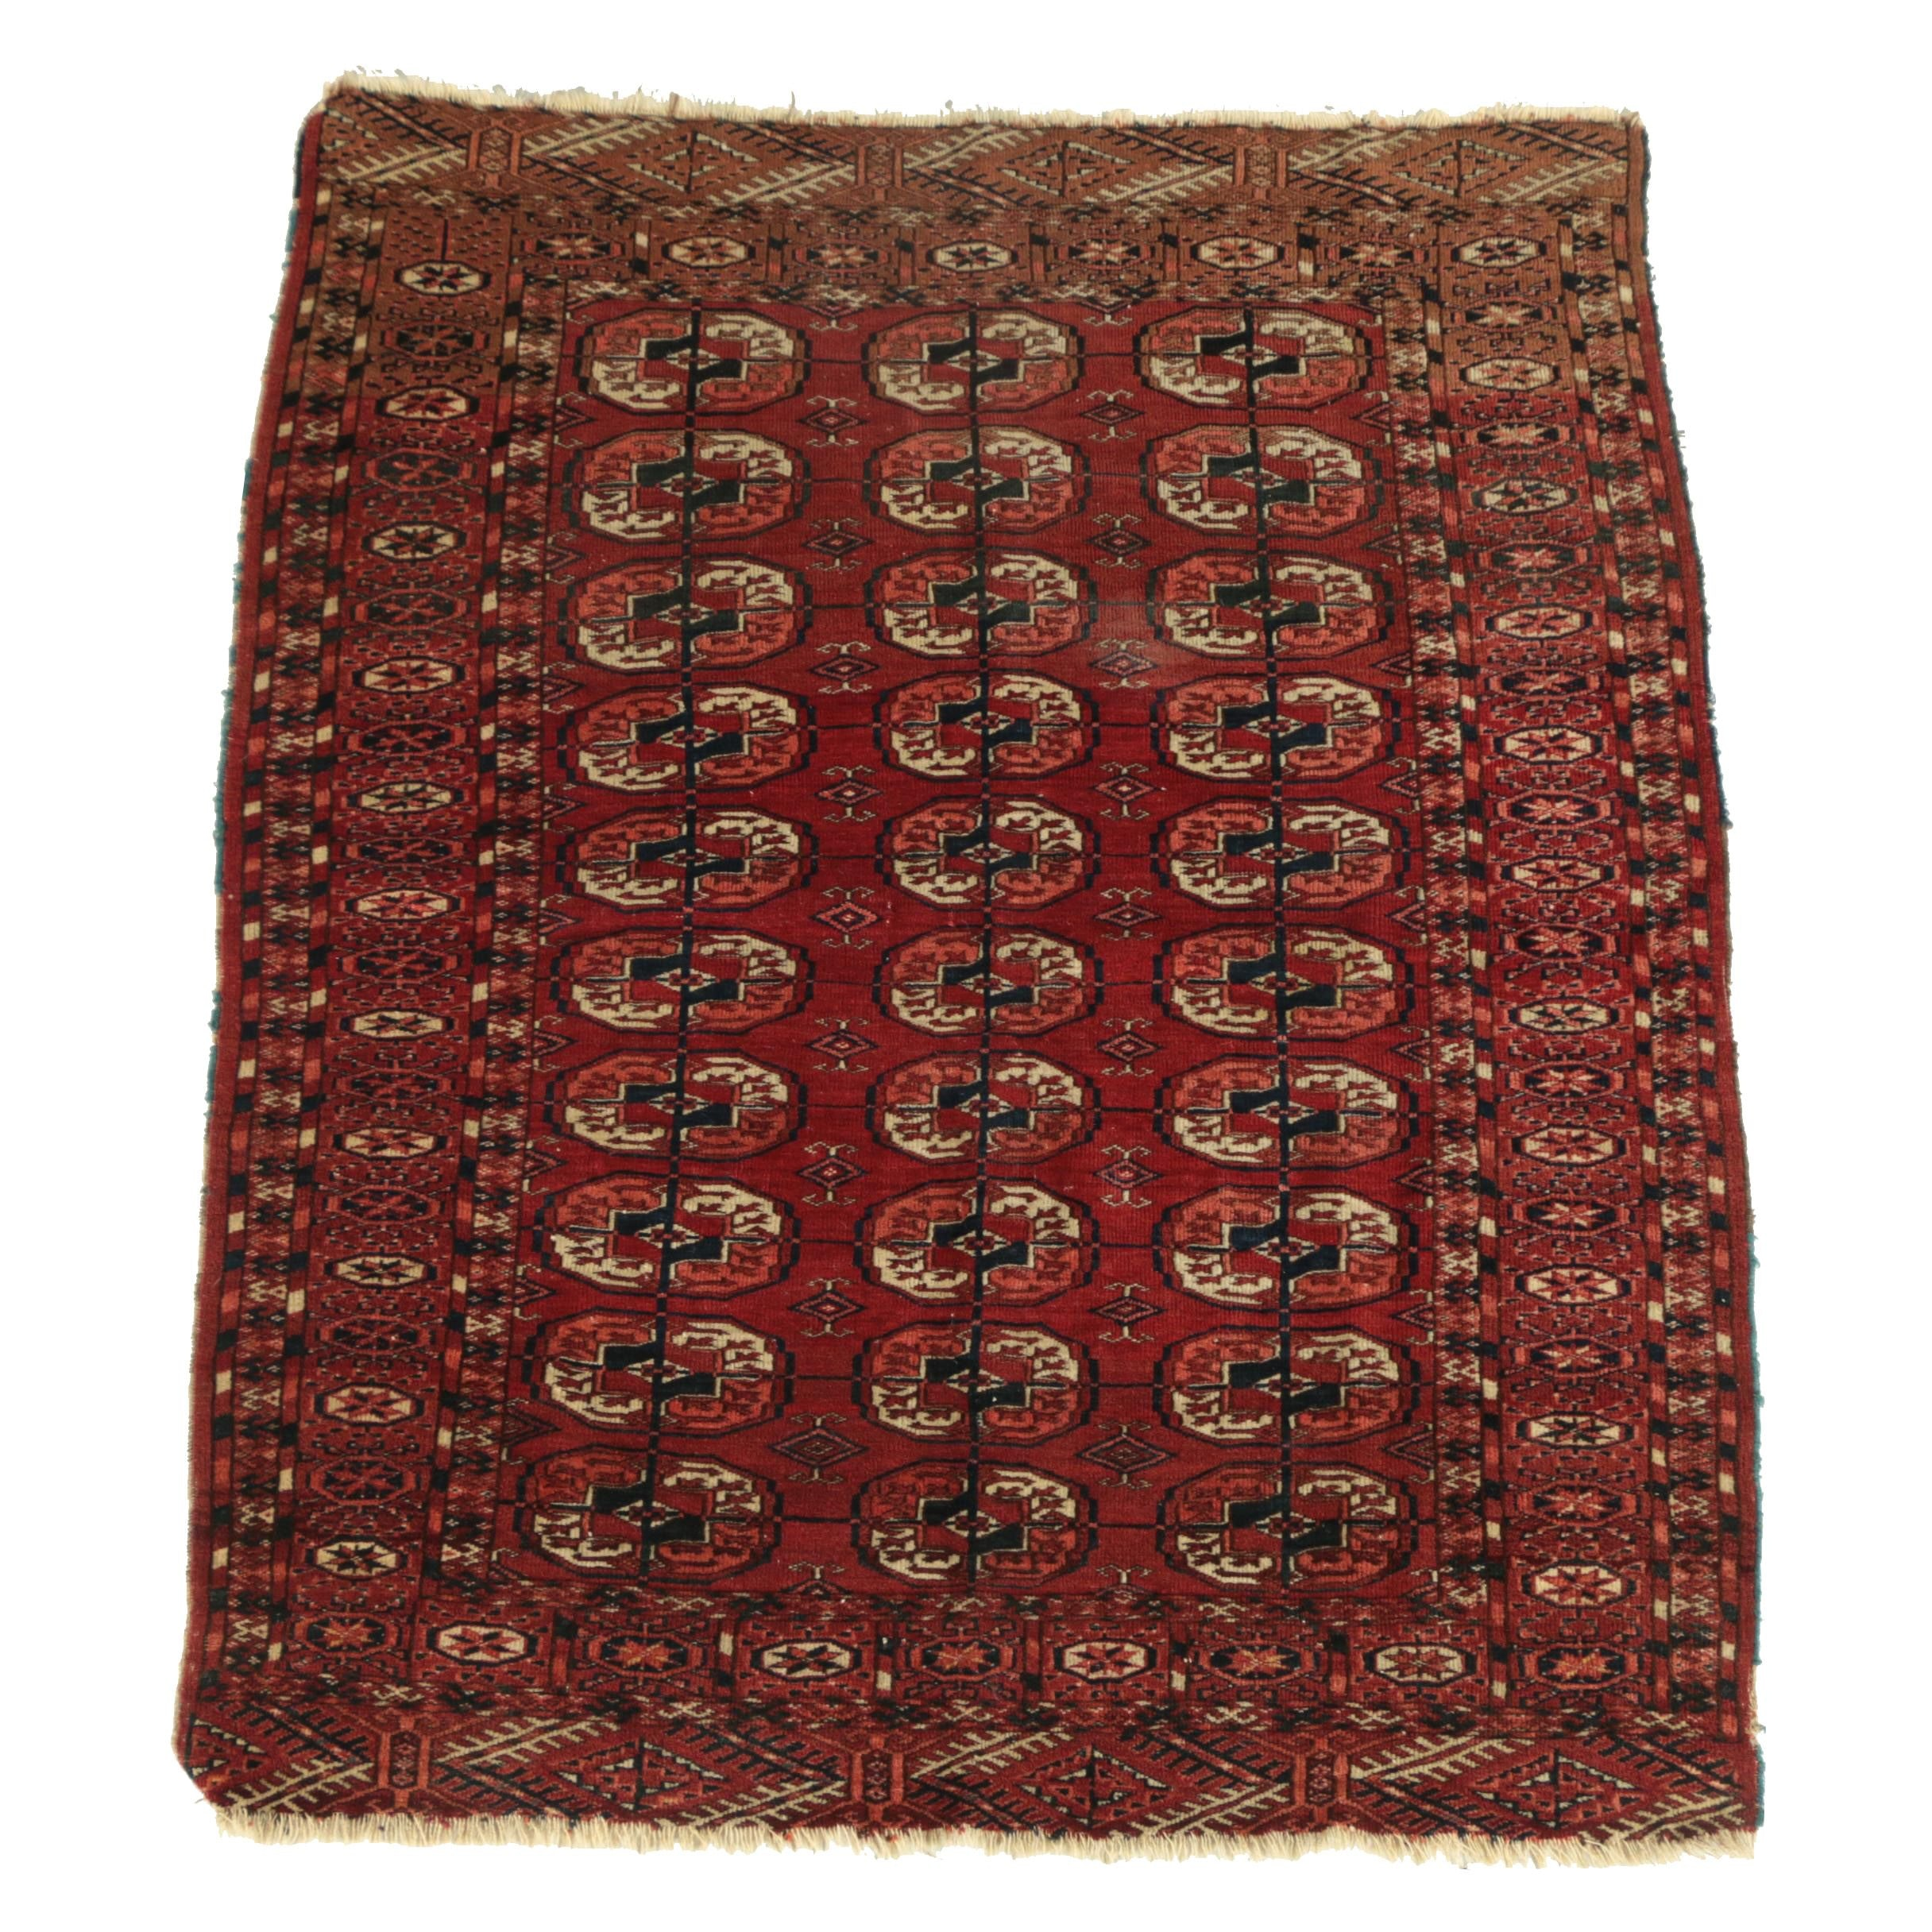 Hand-Knotted Turkmen Tekke Bokhara Wool Area Rug